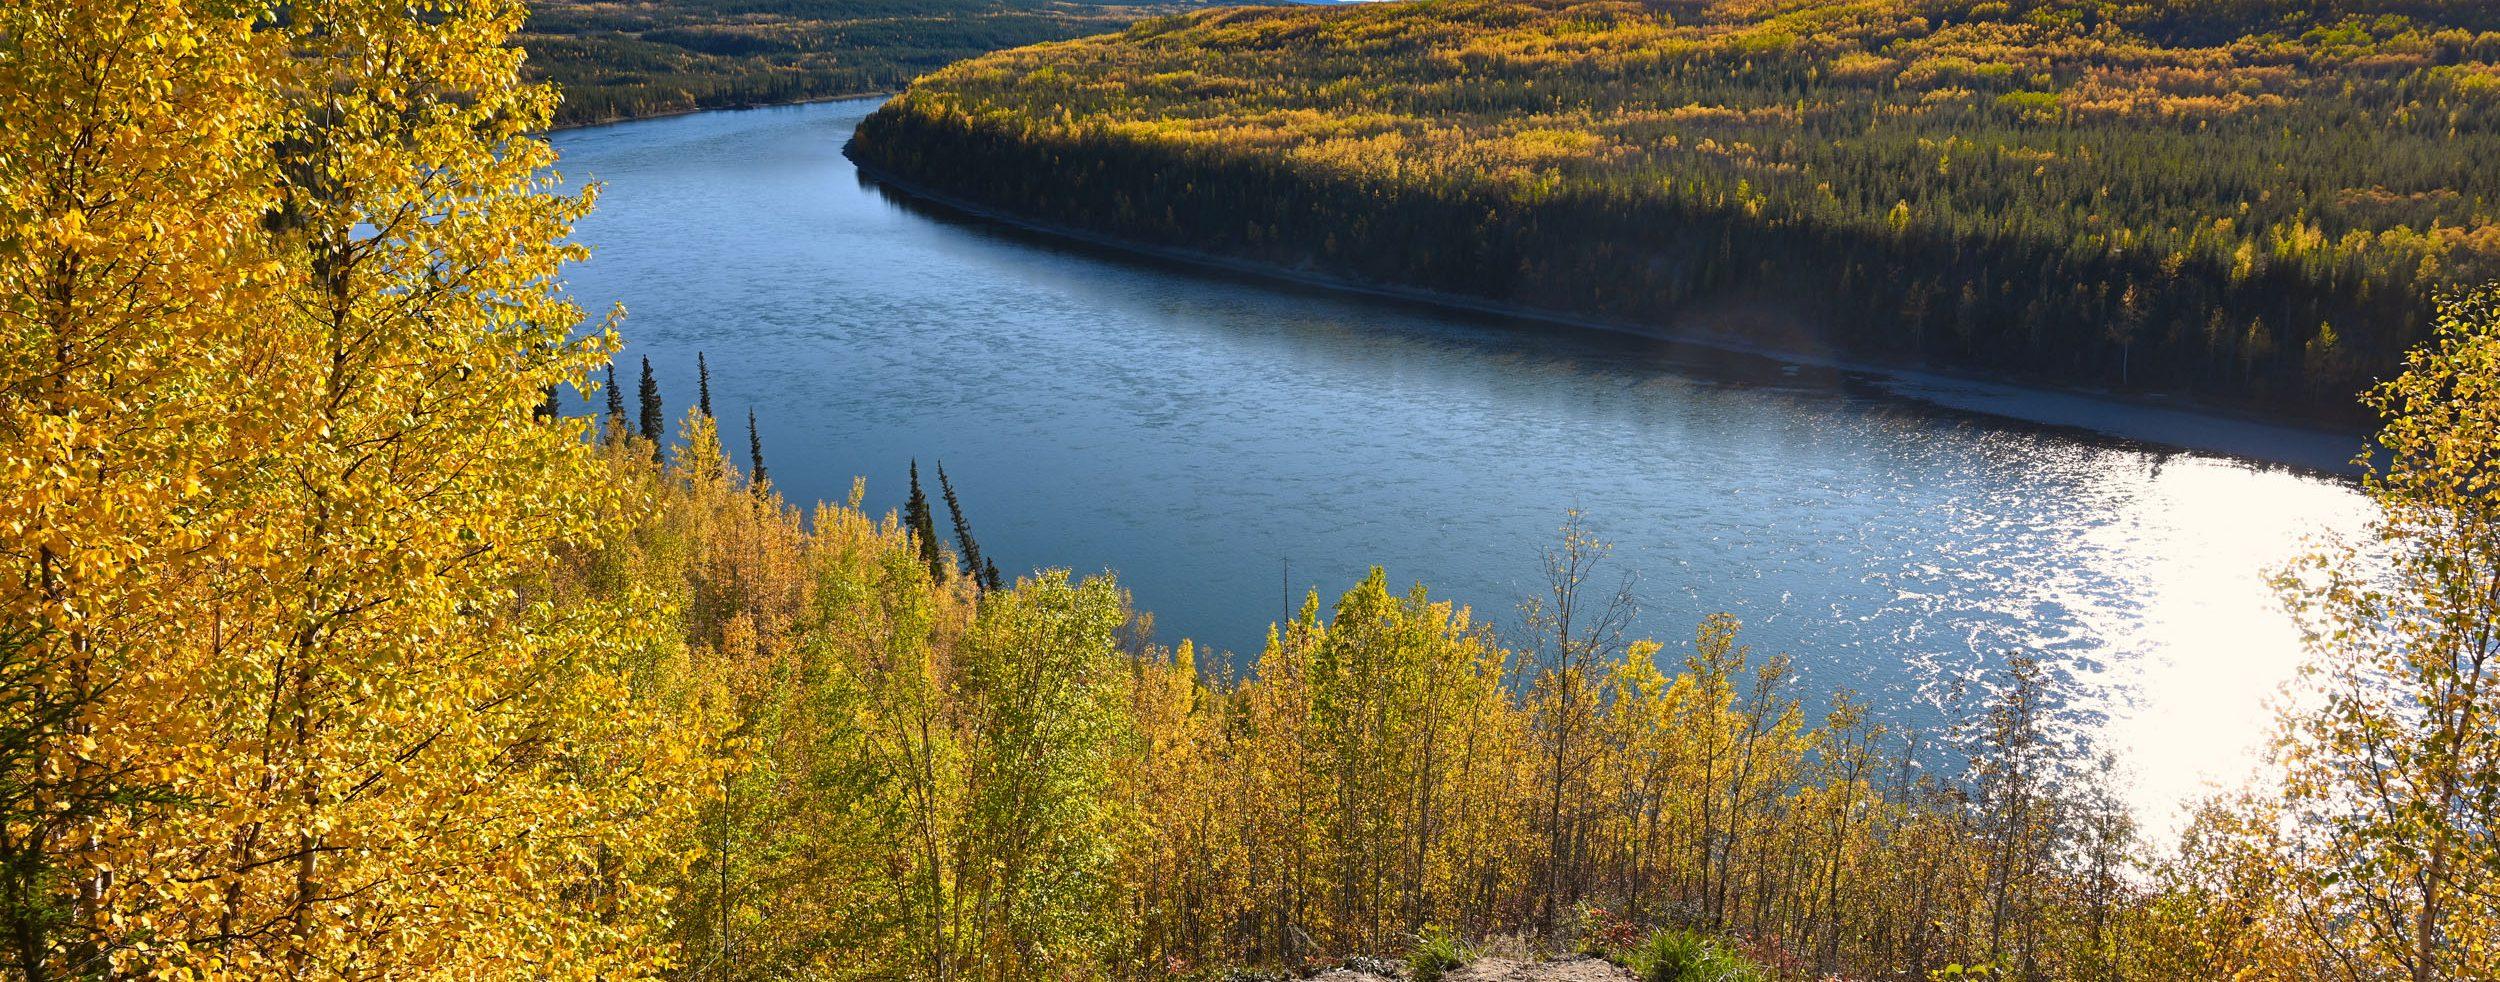 Blick auf den Liard River